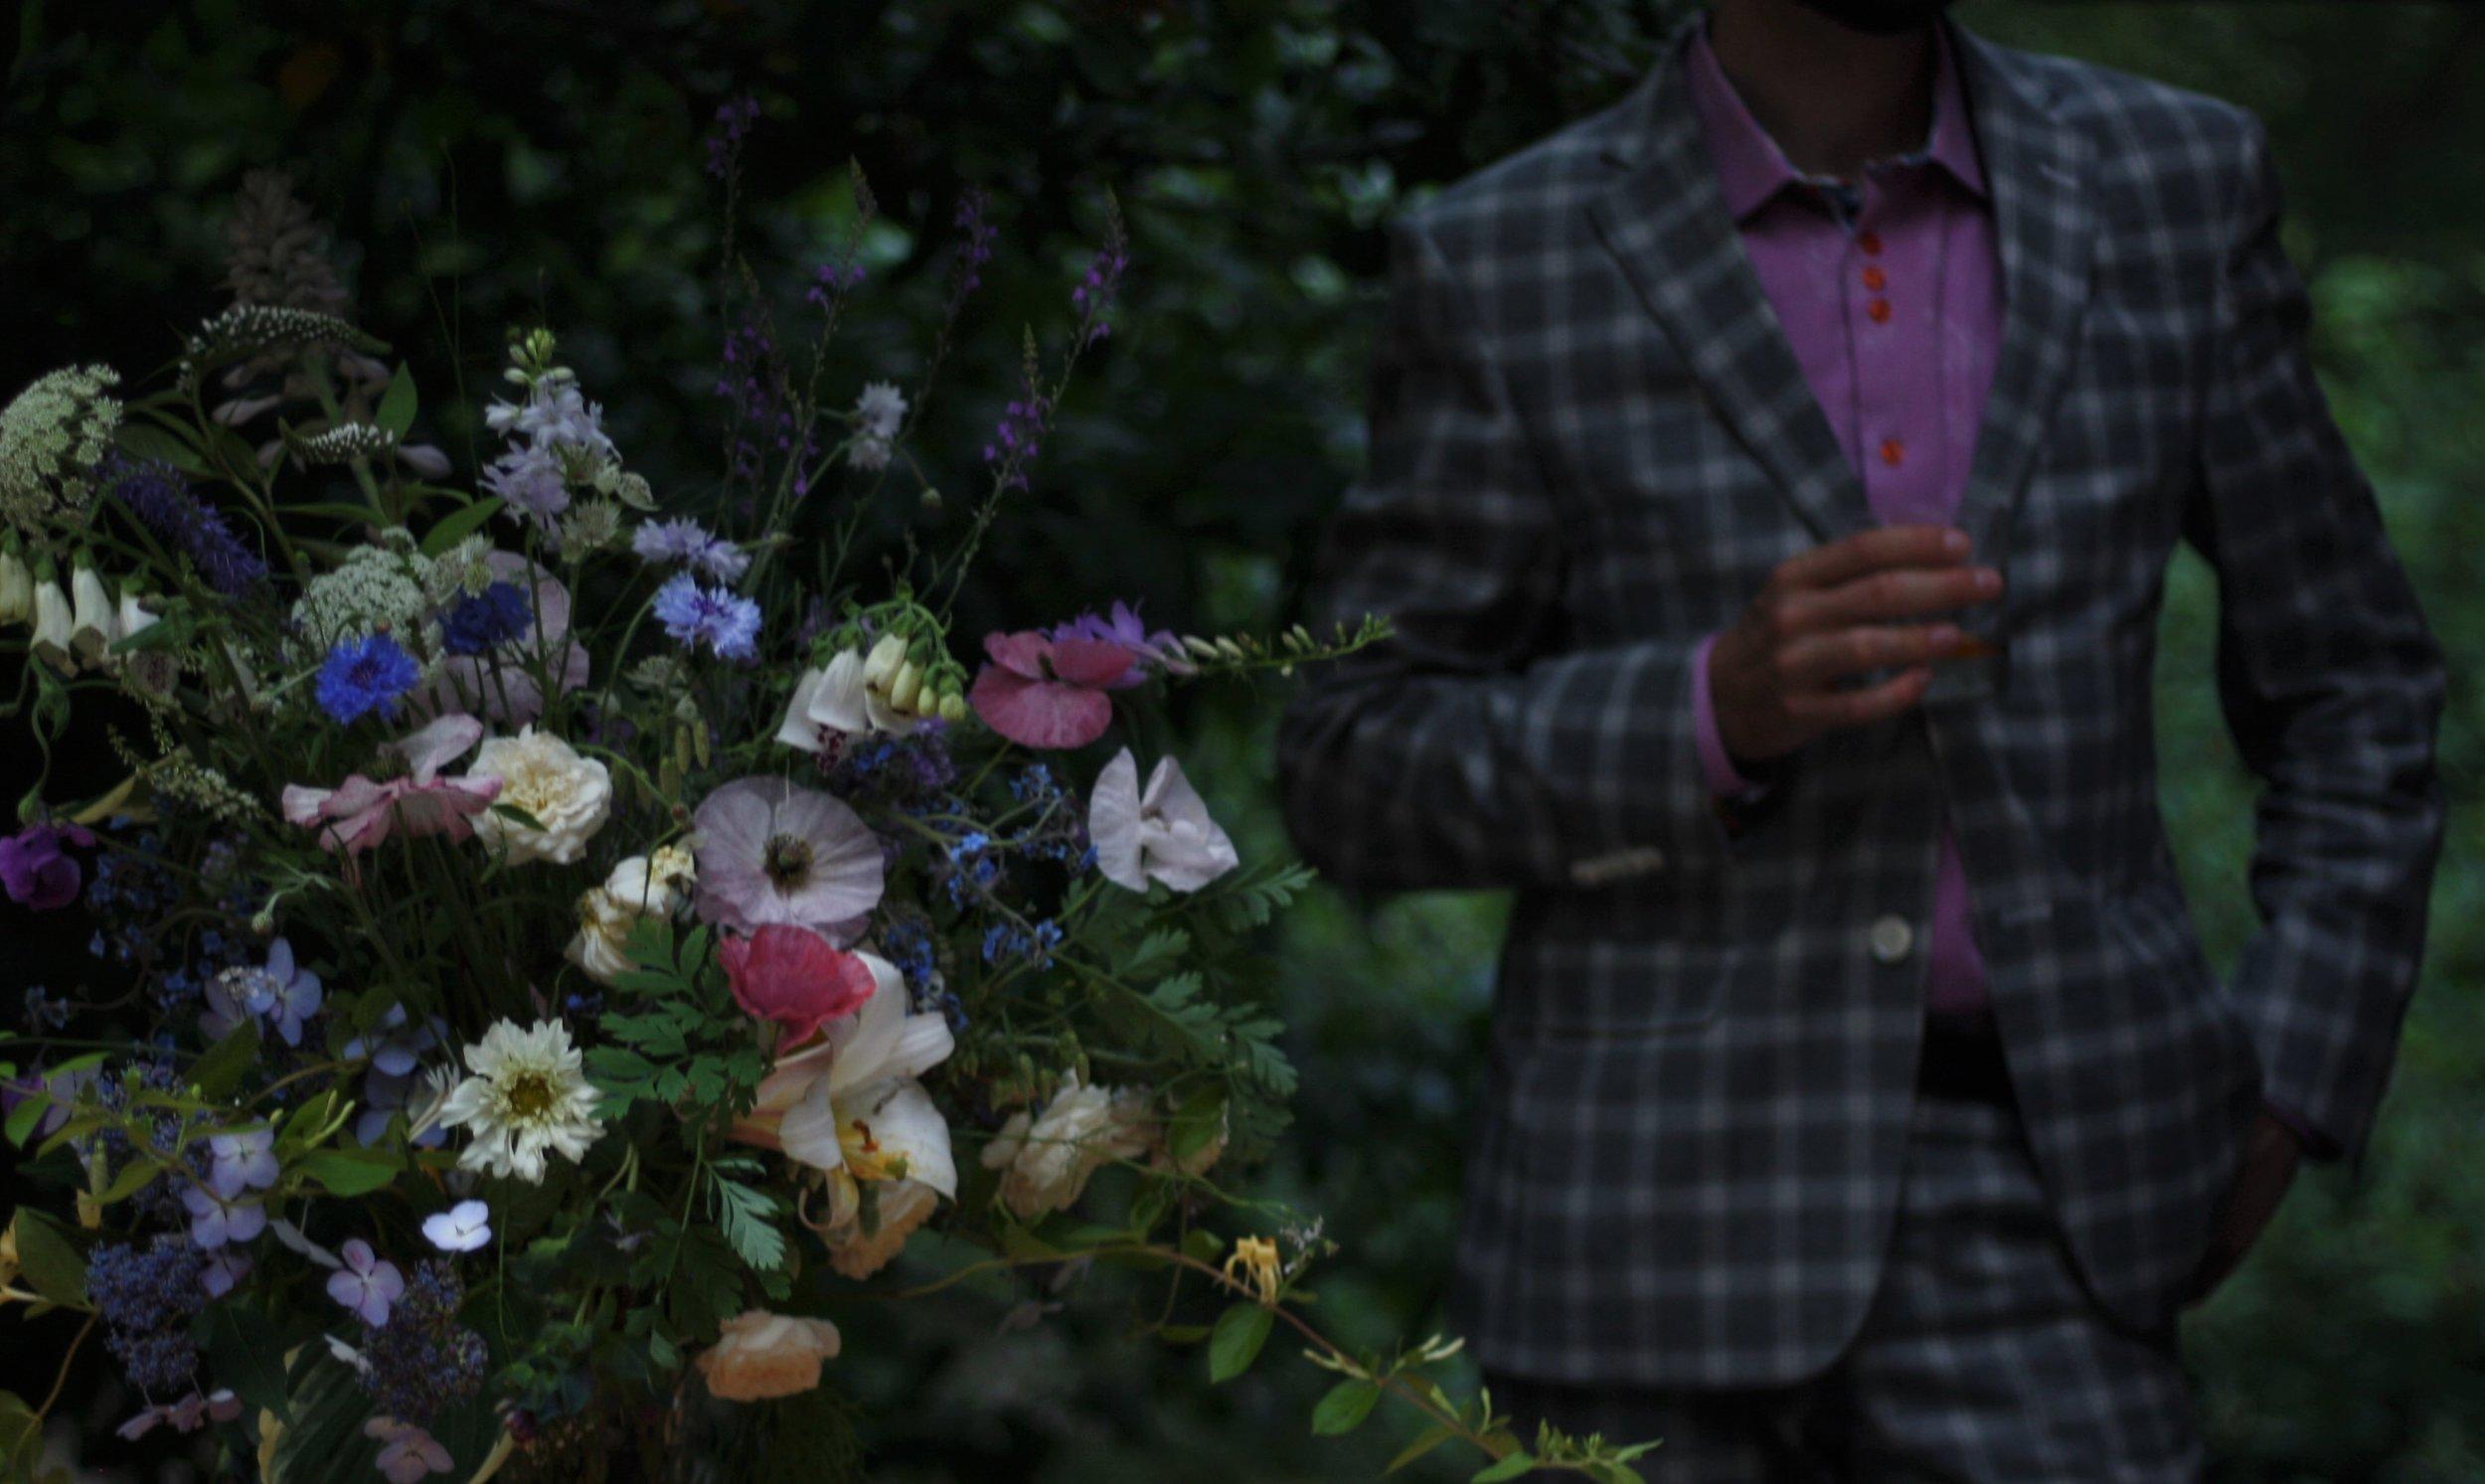 Hedgerow Flower Company's wedding flowers at Windhorse Farm, Nova Scotia